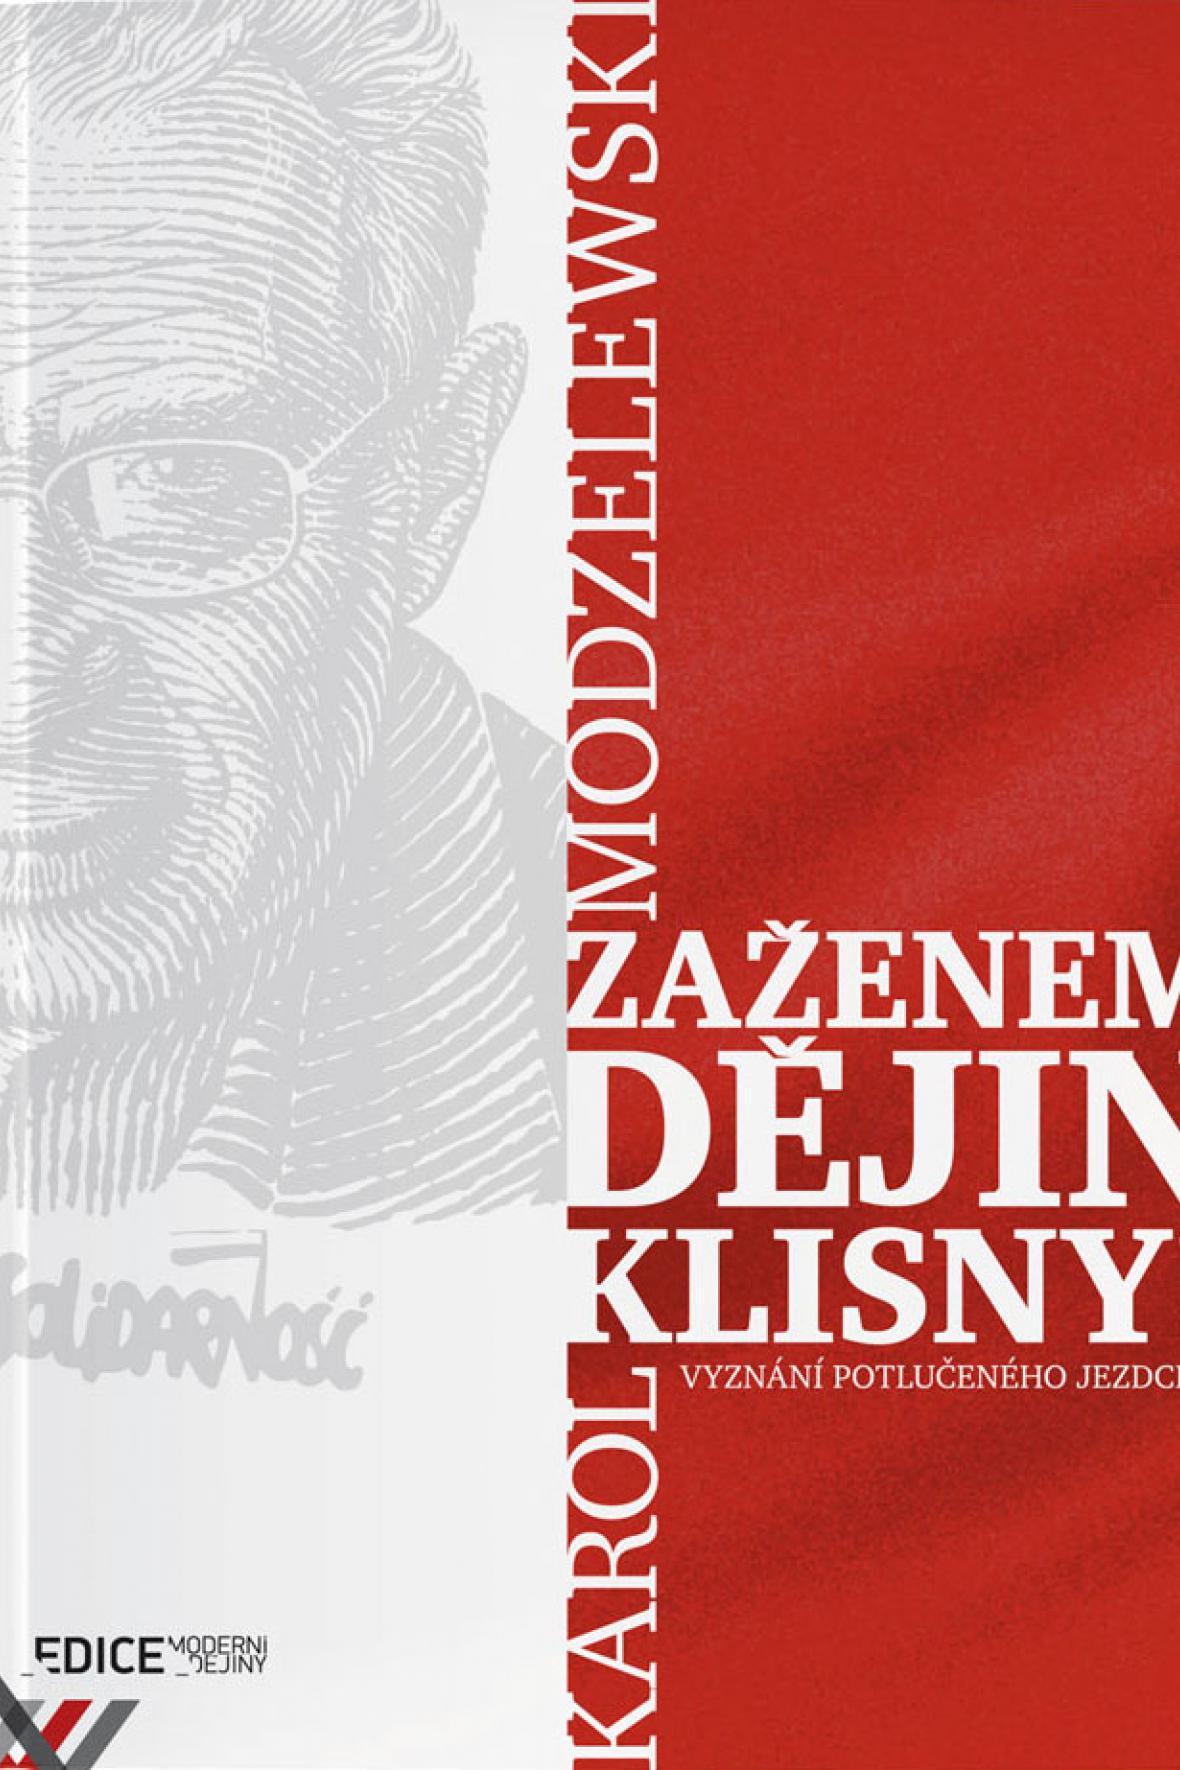 Karol Modzelewski / Zaženem dějin klisny!